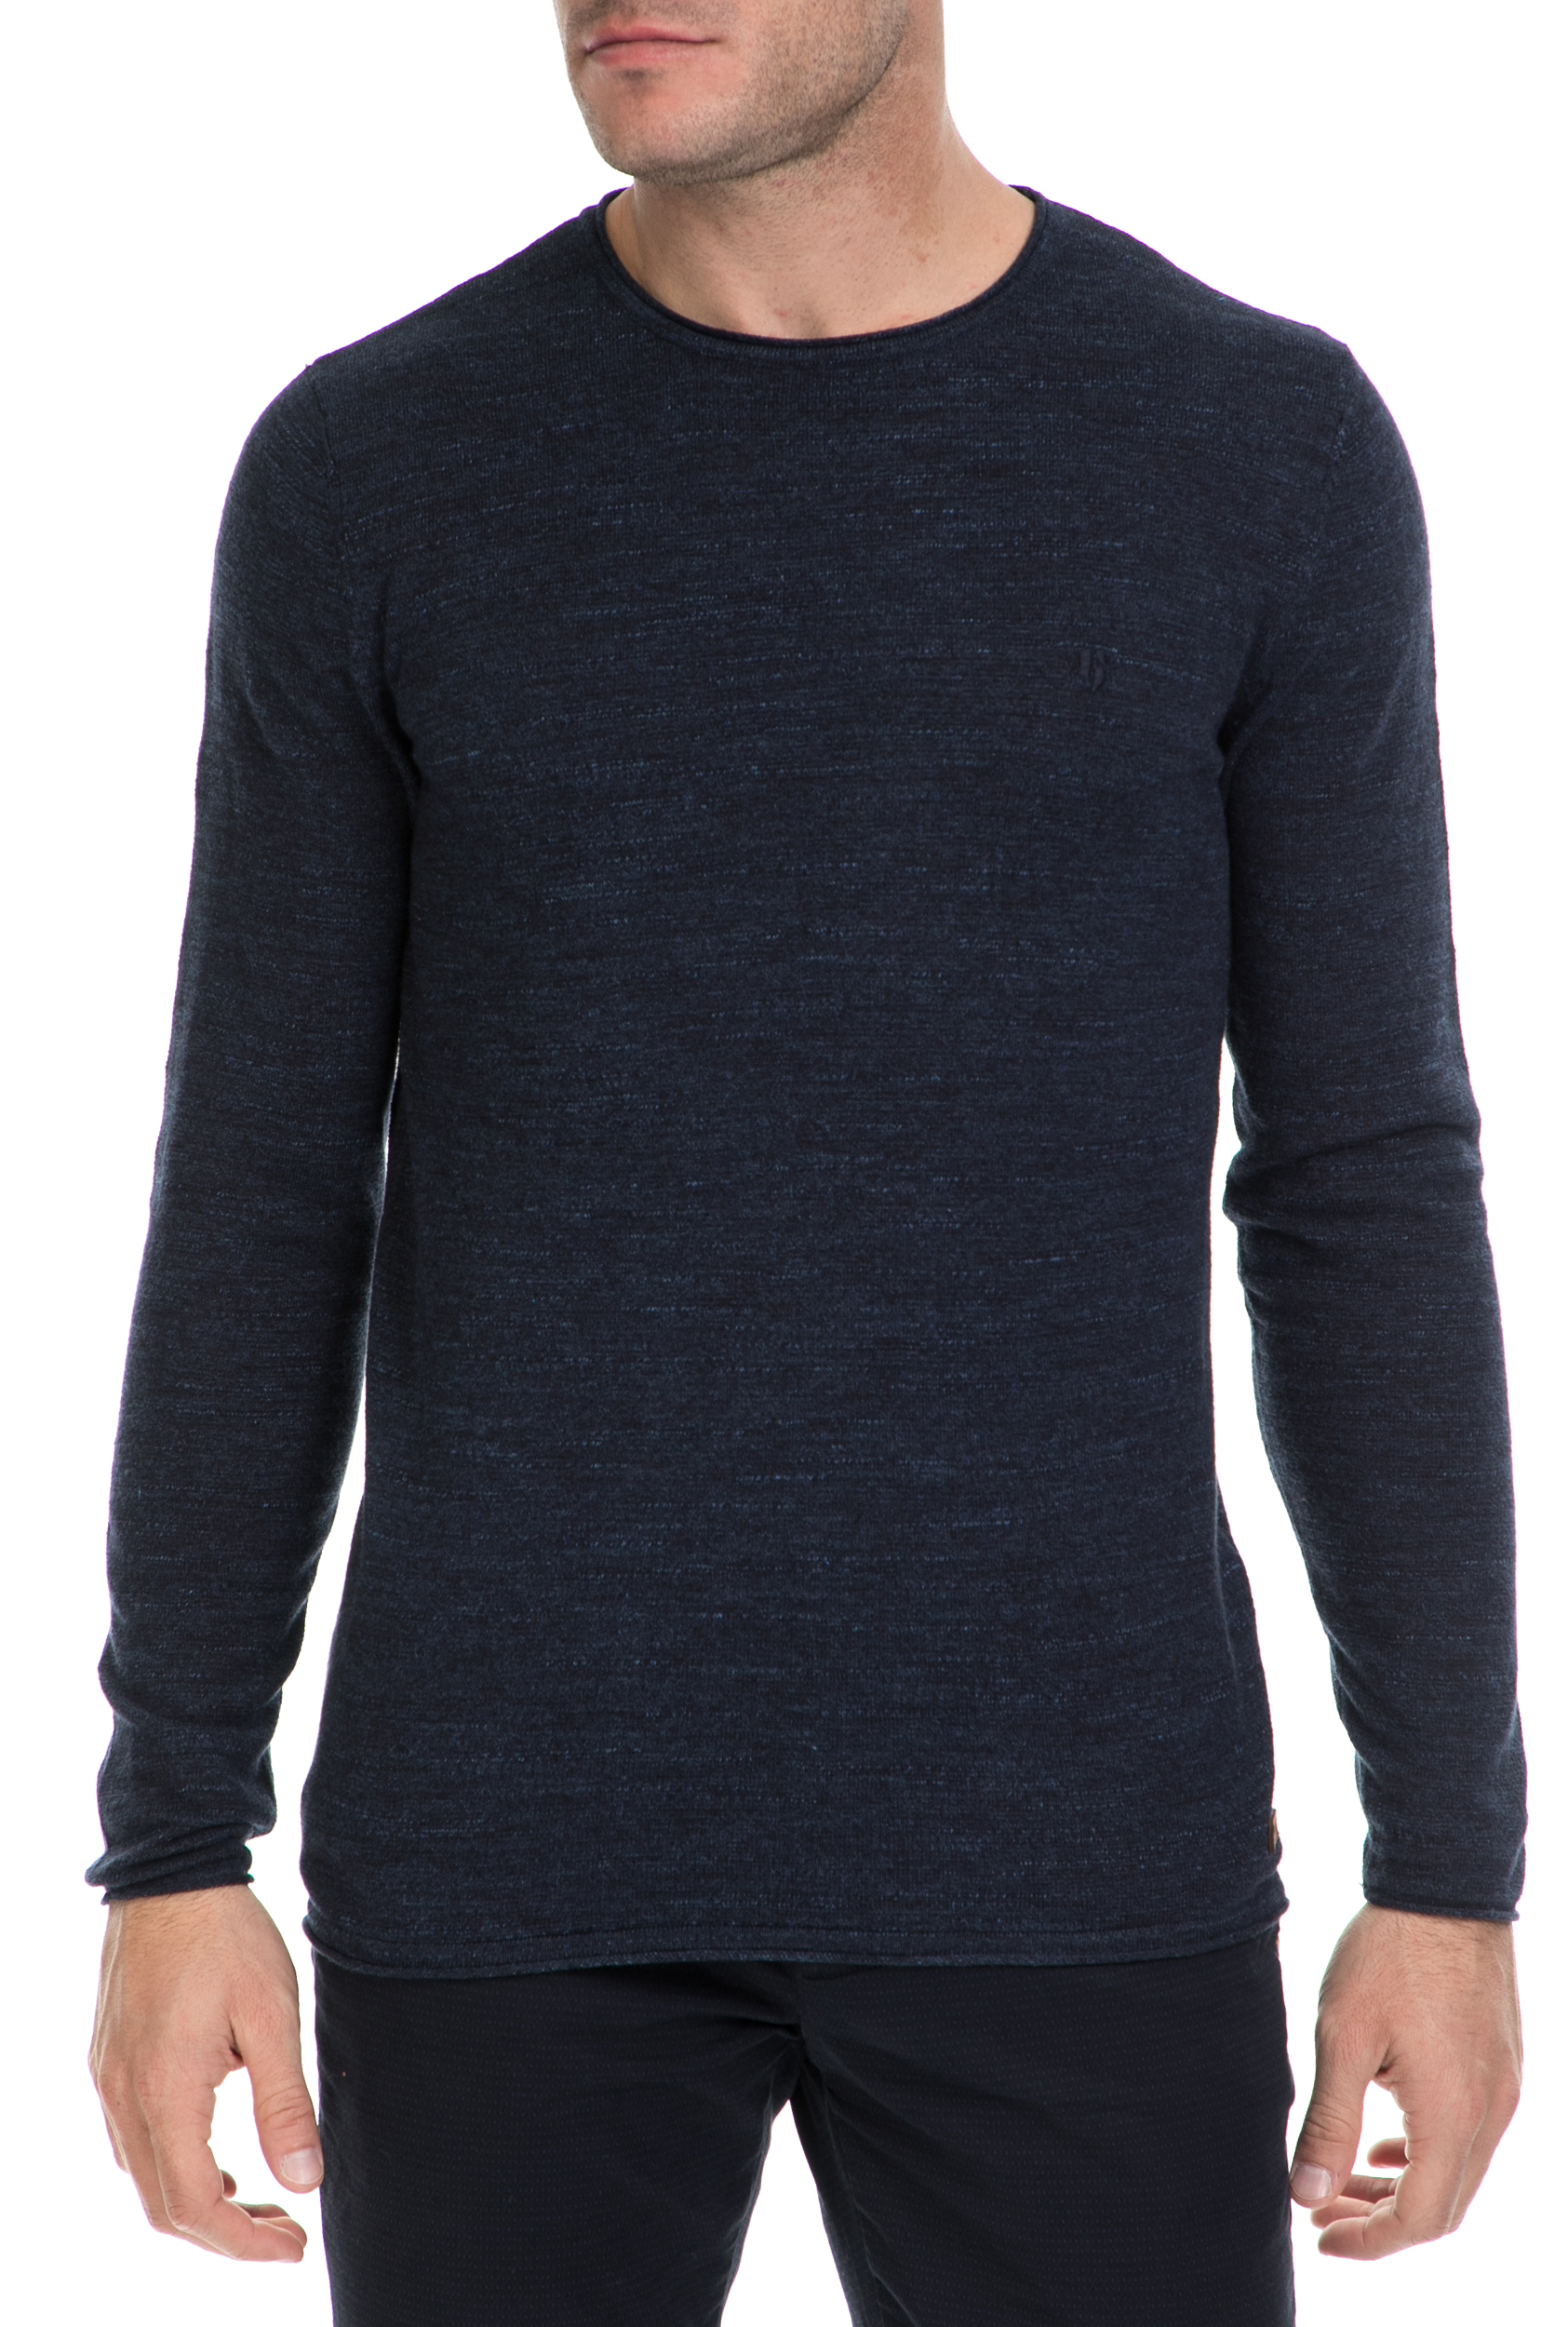 GARCIA JEANS - Ανδρικό πουλόβερ Guido GARCIA JEANS μπλε ανδρικά ρούχα πλεκτά ζακέτες μπλούζες